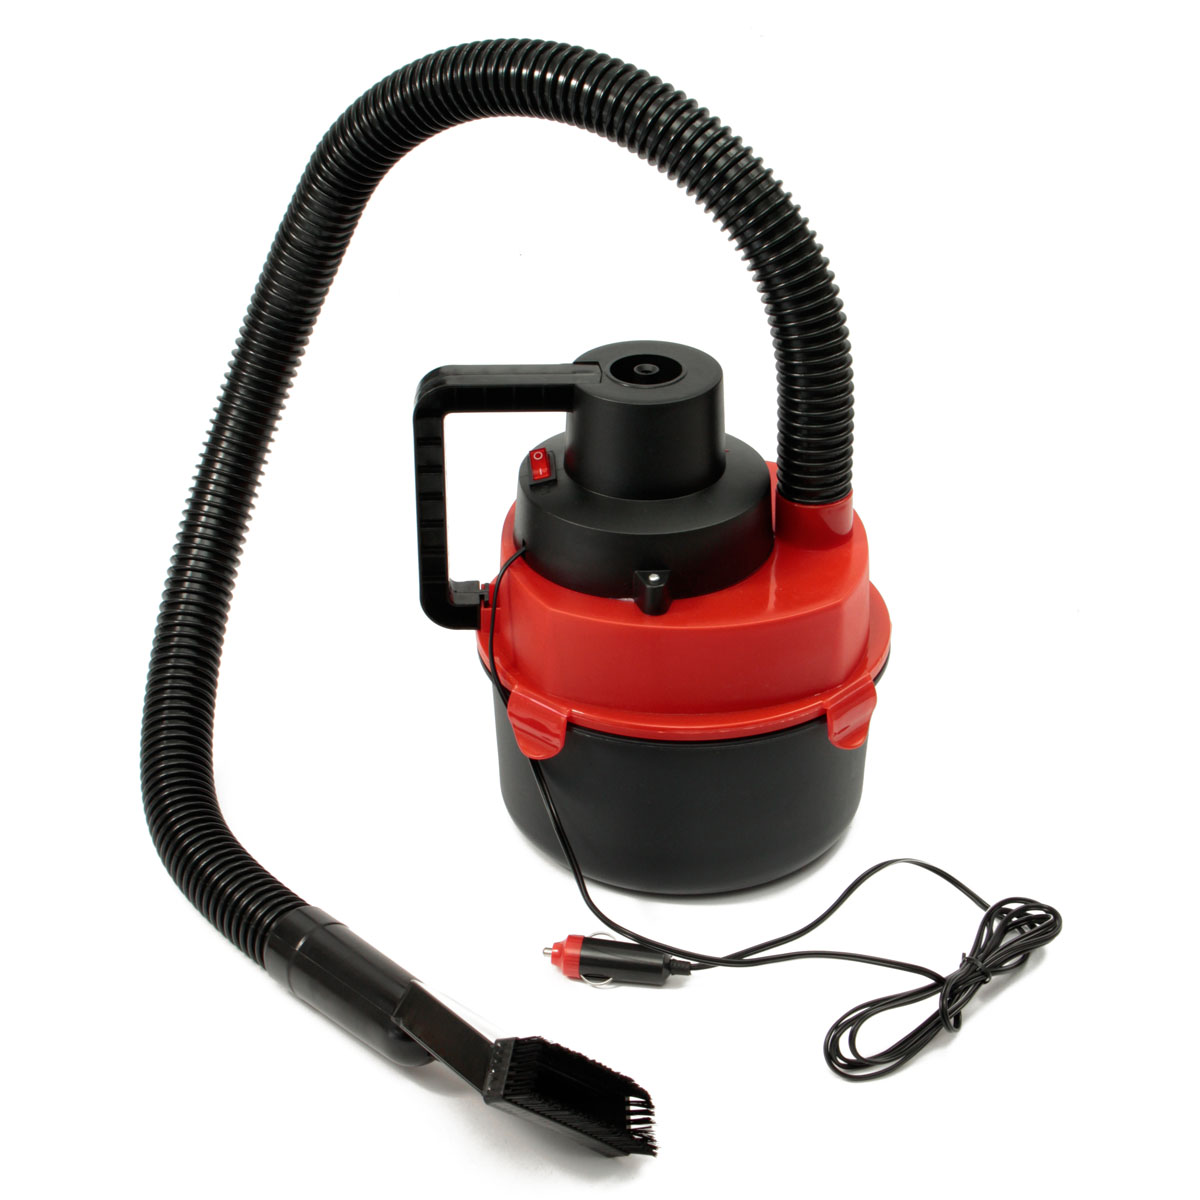 imágenes para A Estrenar 12 V Wet Dry Portable Mini Aspirador de Alfombras Coche Barco Bomba de Inflado de Aire Rojo